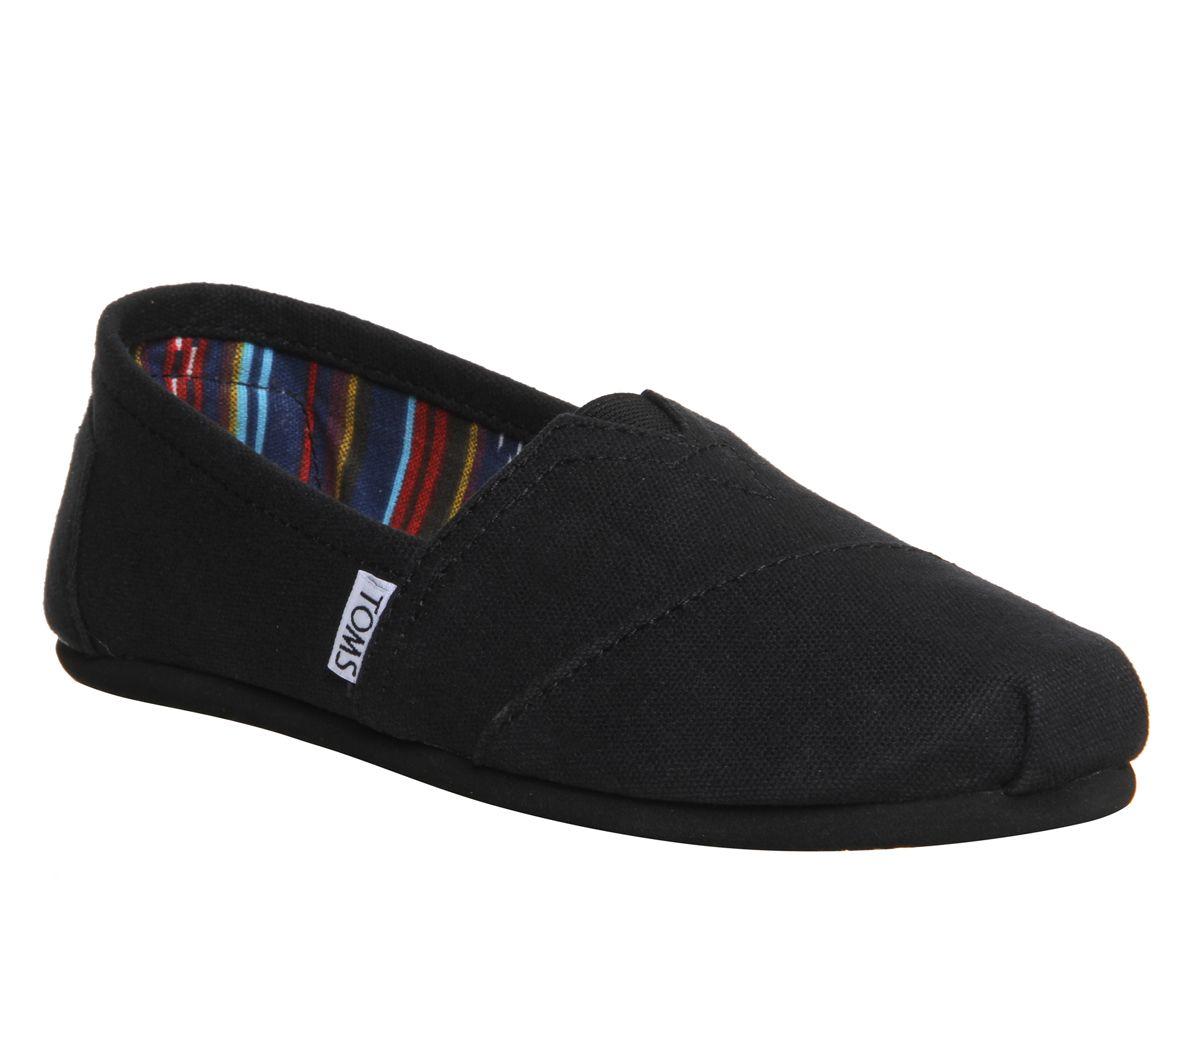 7981faa9645f Toms Classic Slip Ons Black Mono - Flats